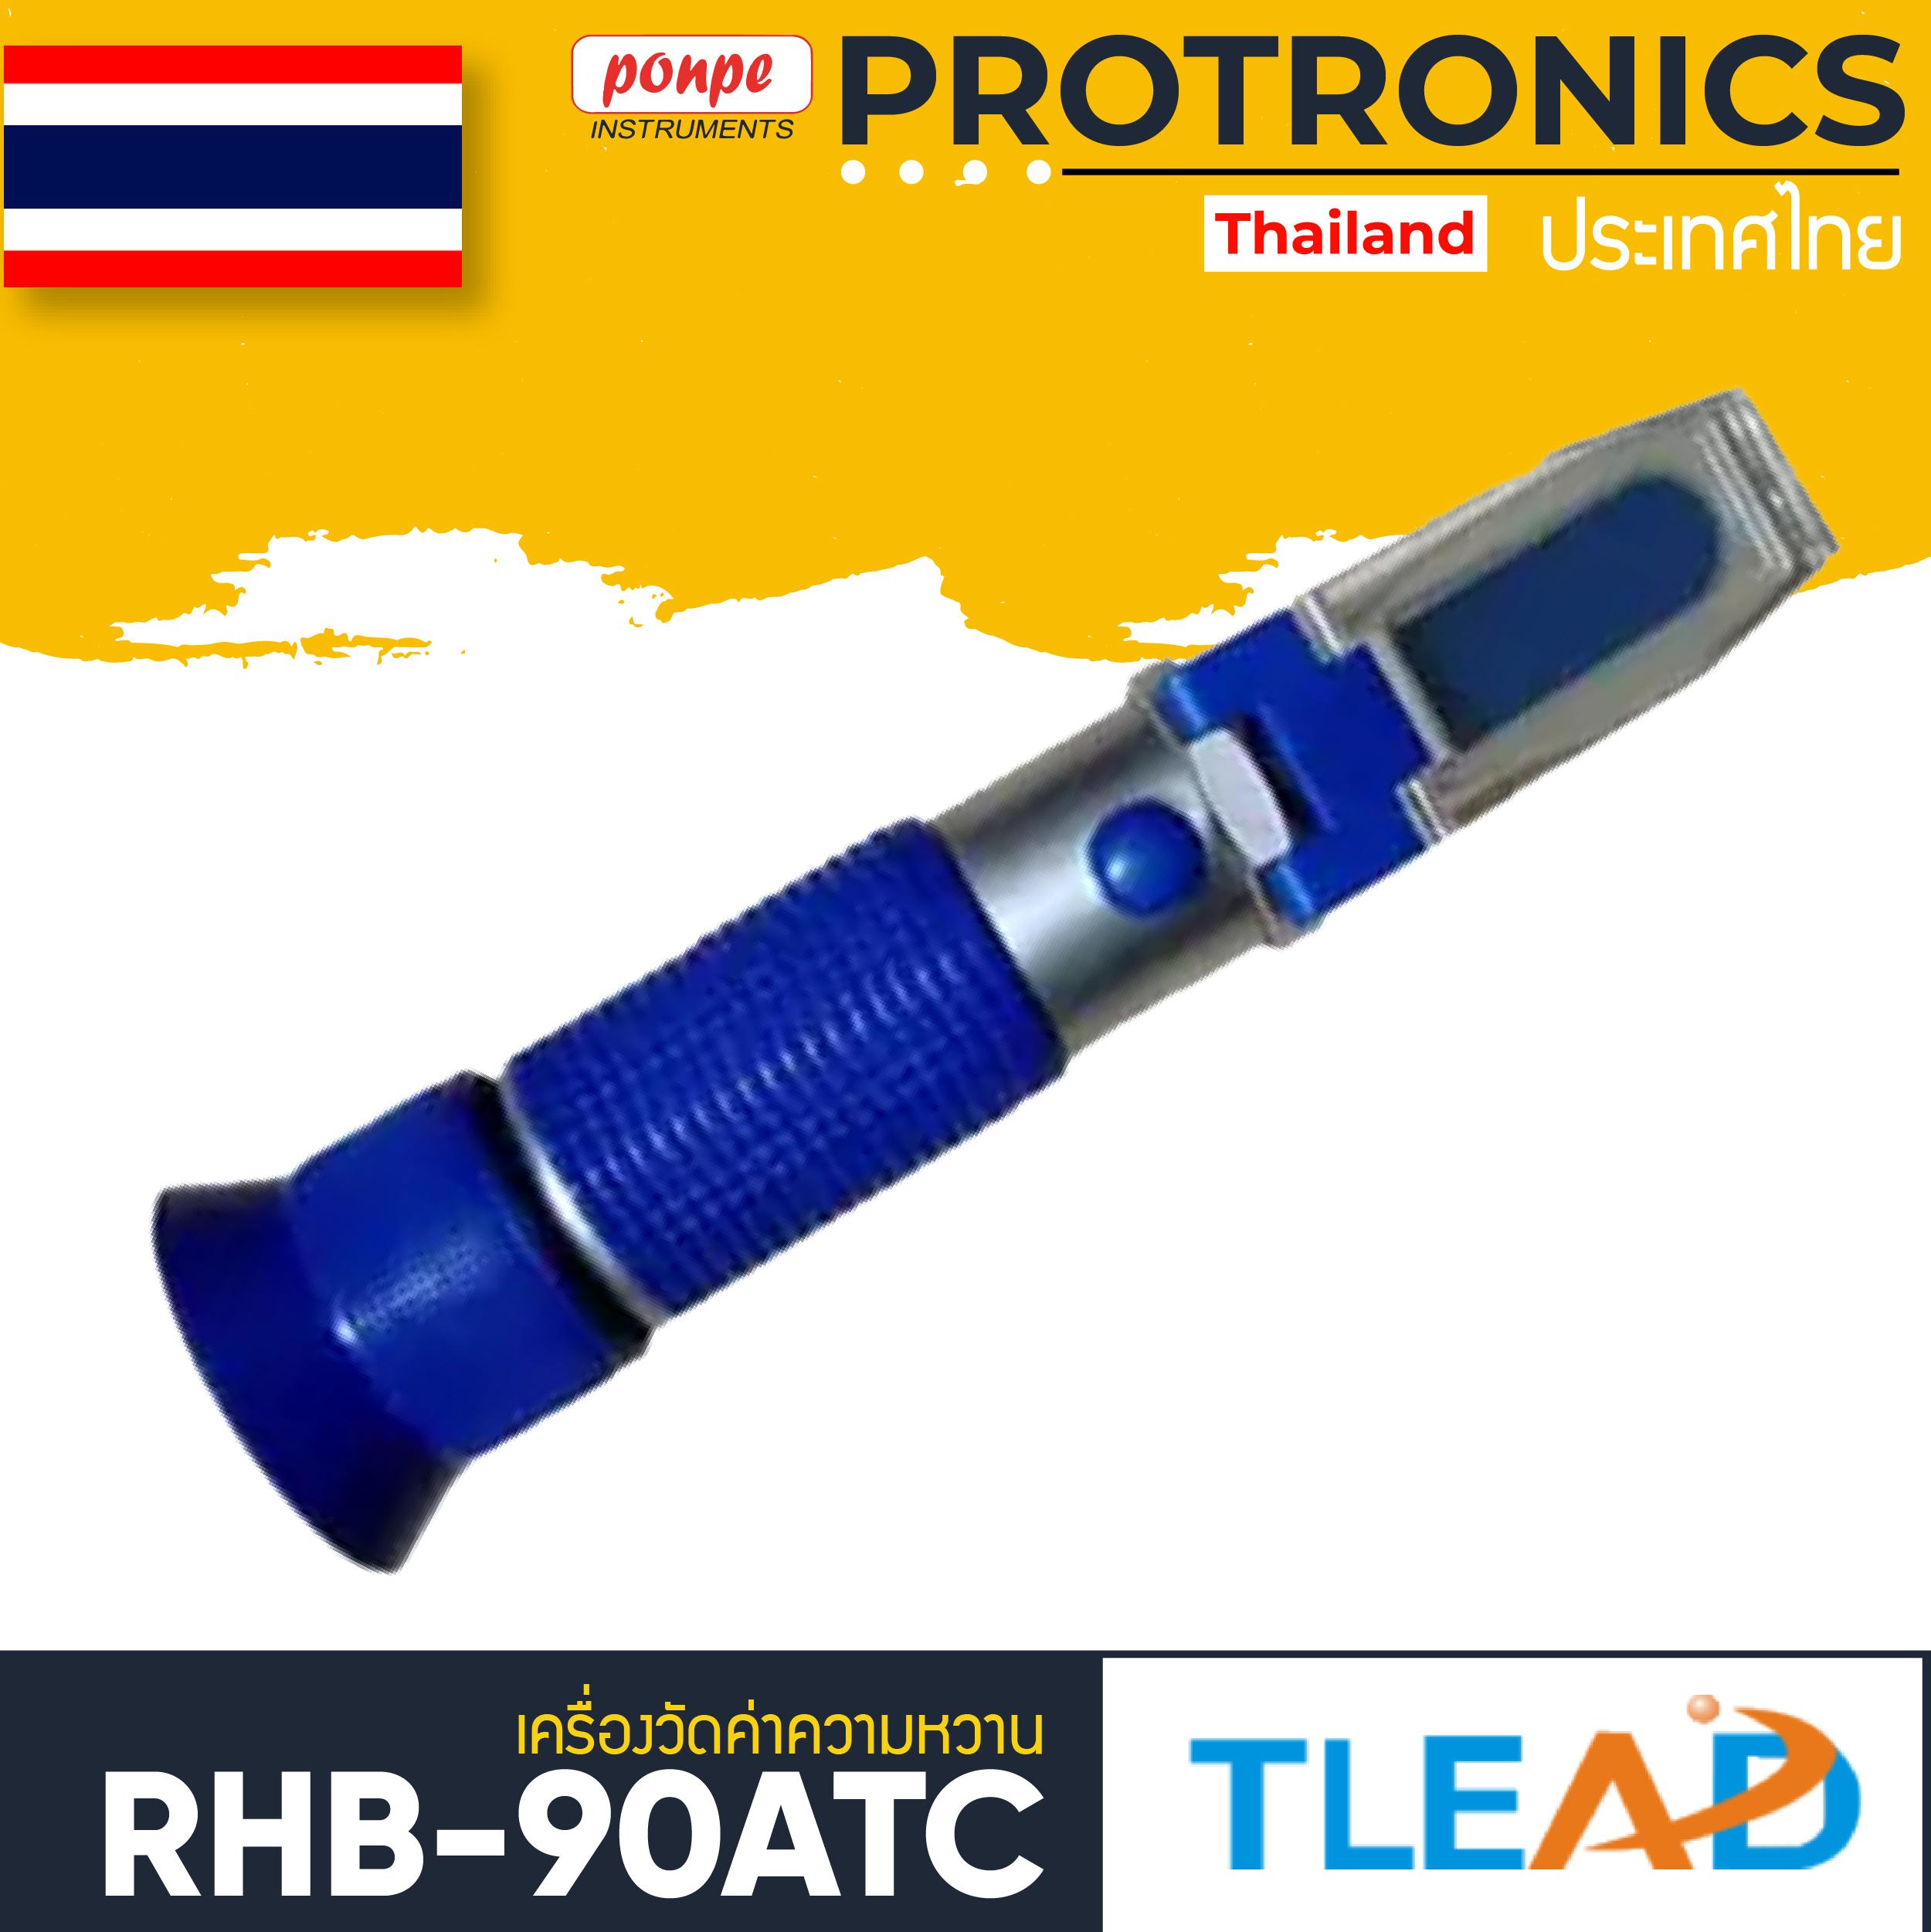 RHB-90ATC JEDTO Brix Refractometer เครื่องวัดความหวาน  แบบกล้องส่อง